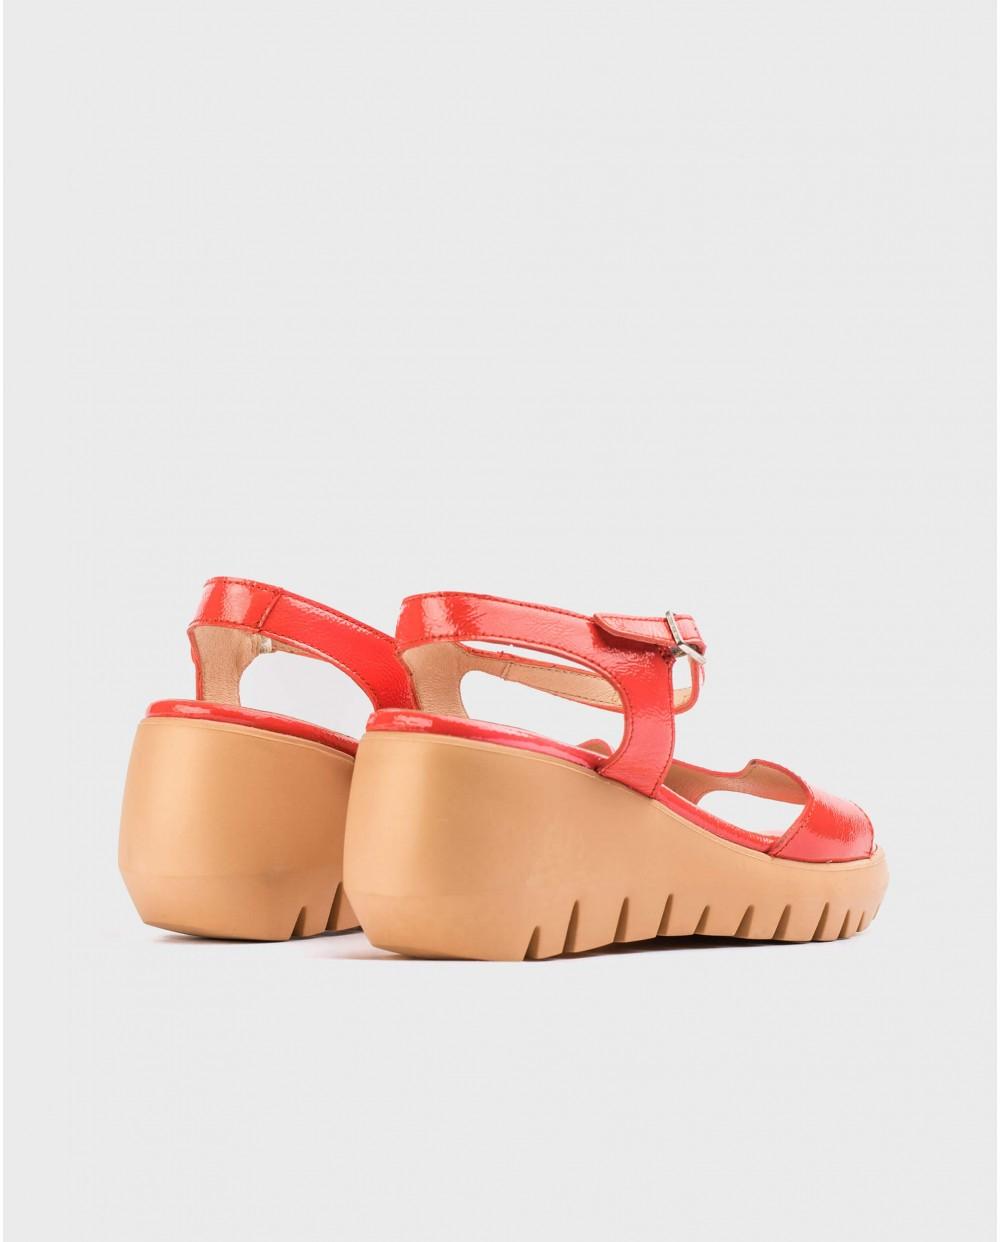 Wonders-Sandals-Patent leather wave sandal